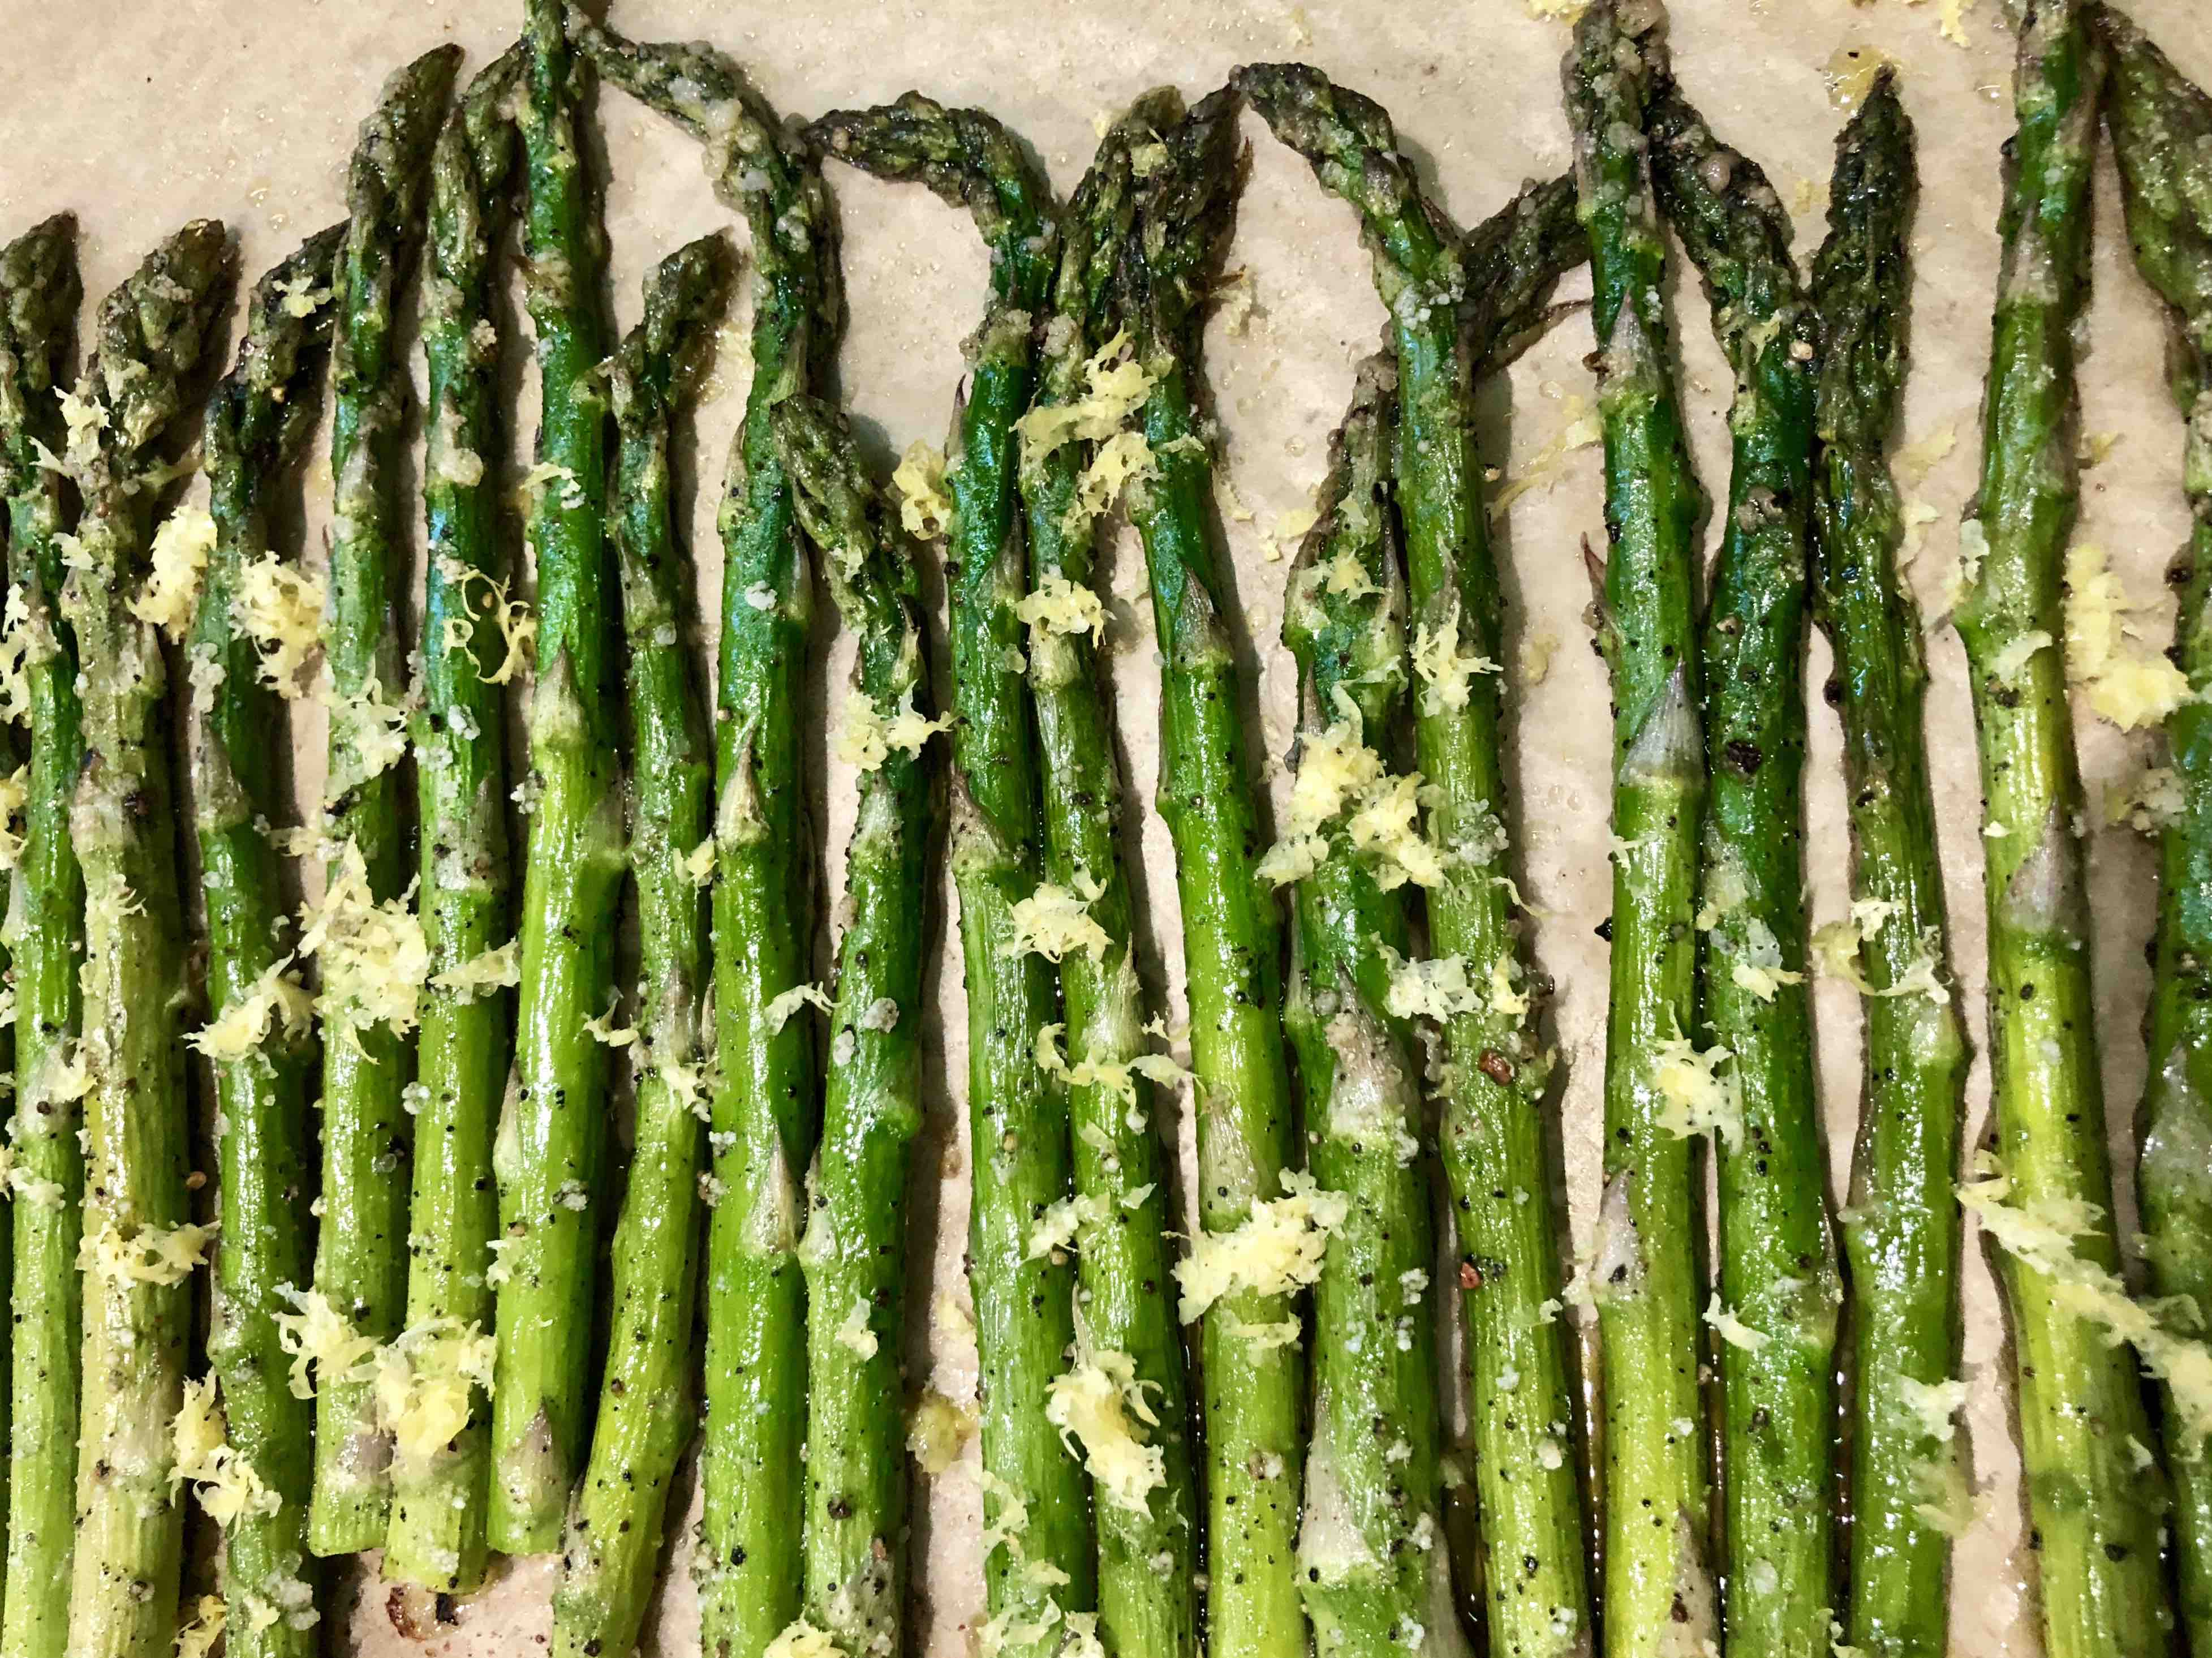 roasted asparagus feat. lemon zest